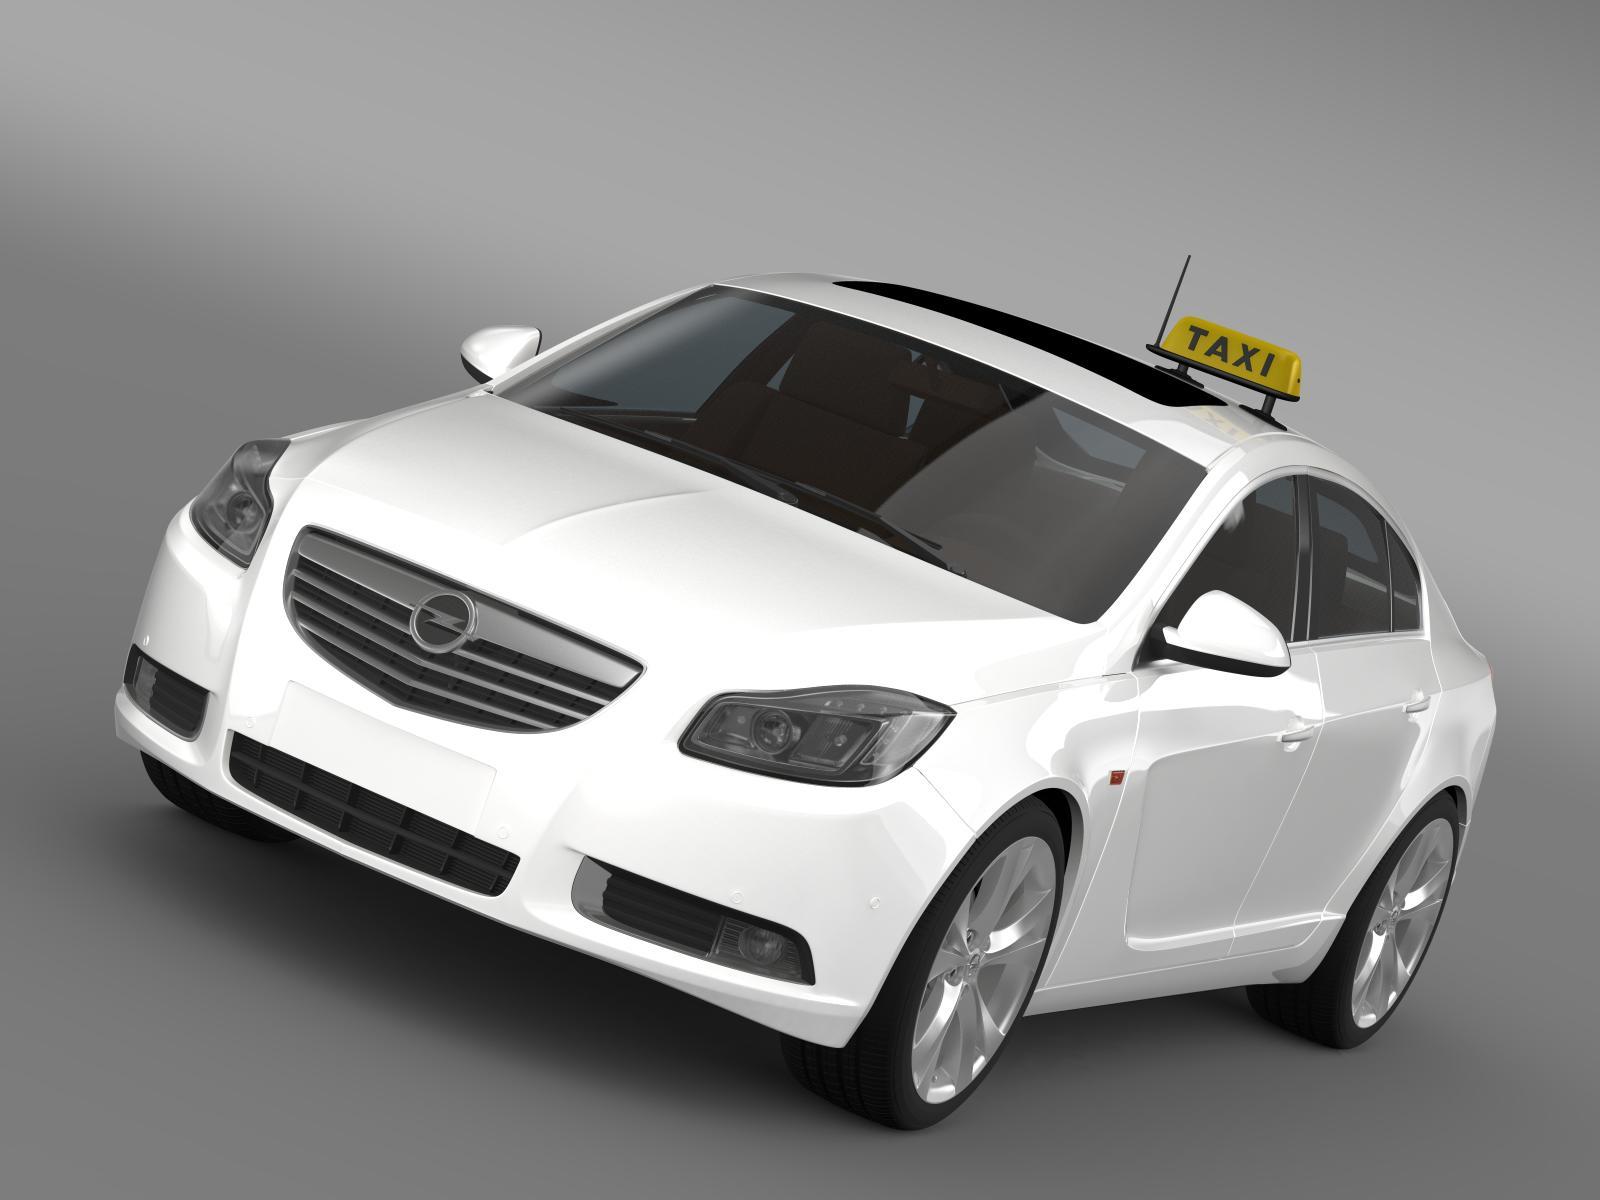 Opel Insignia Taxi 3d model 3ds max fbx c4d lwo ma mb hrc xsi obj 203961